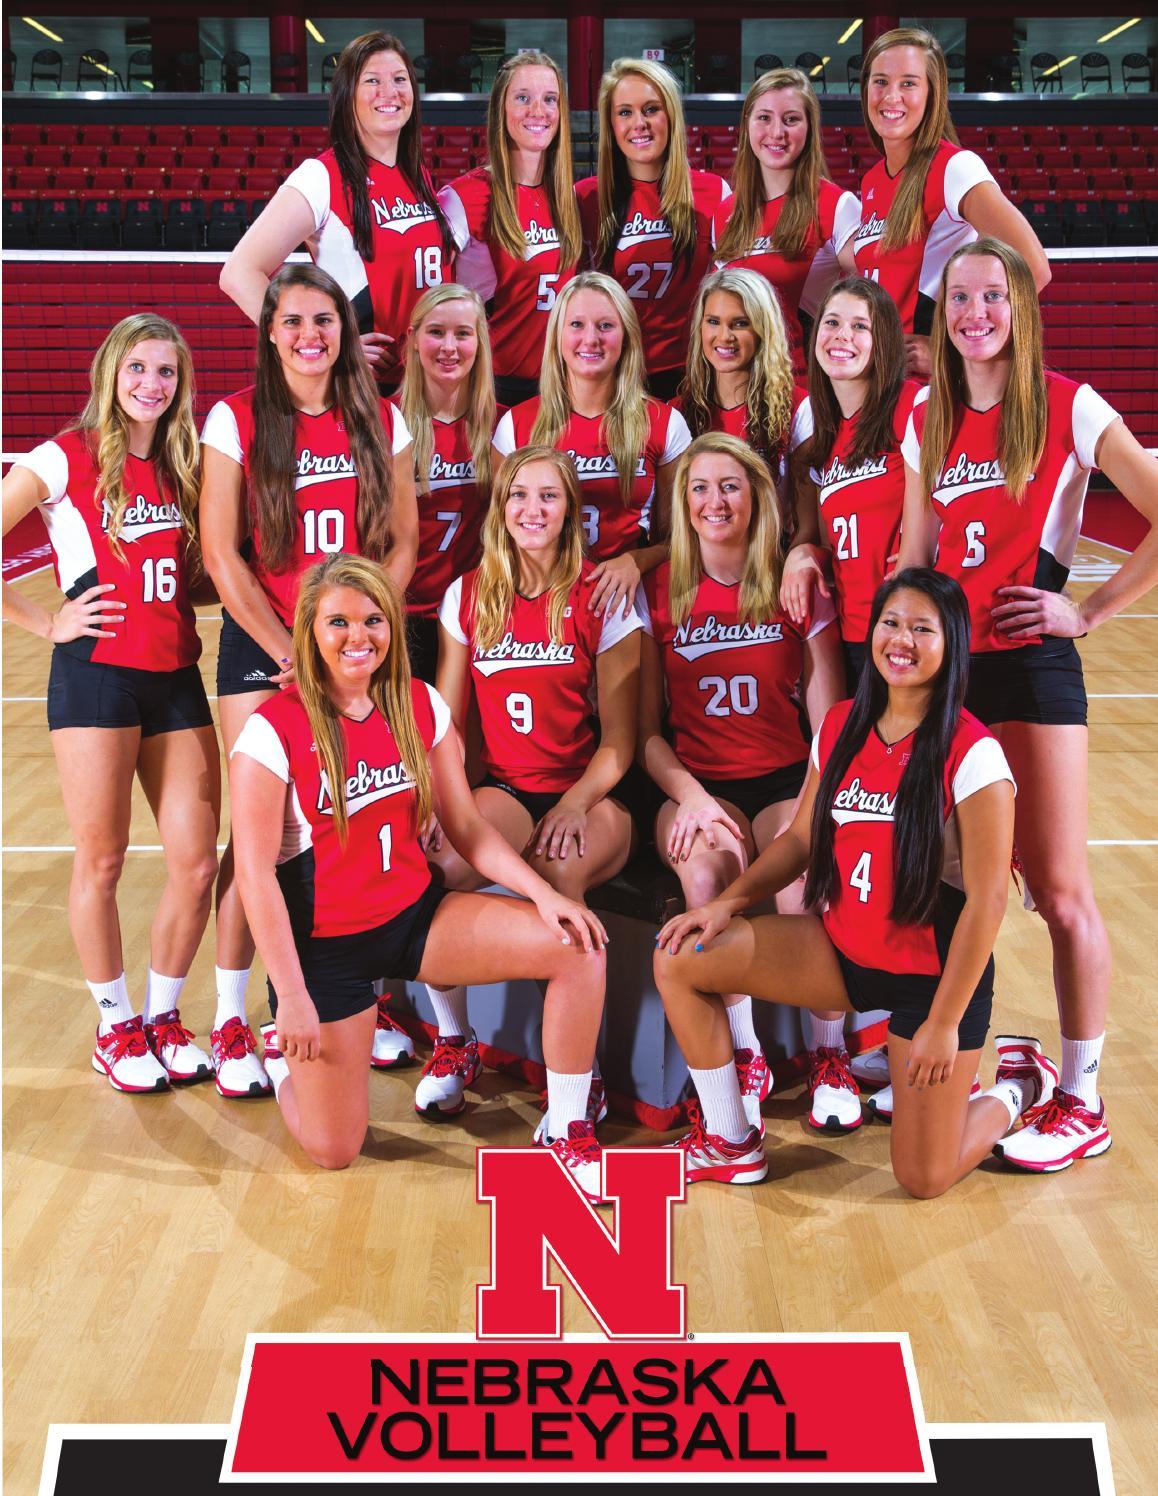 Nebraska Cornhuskers womens volleyball